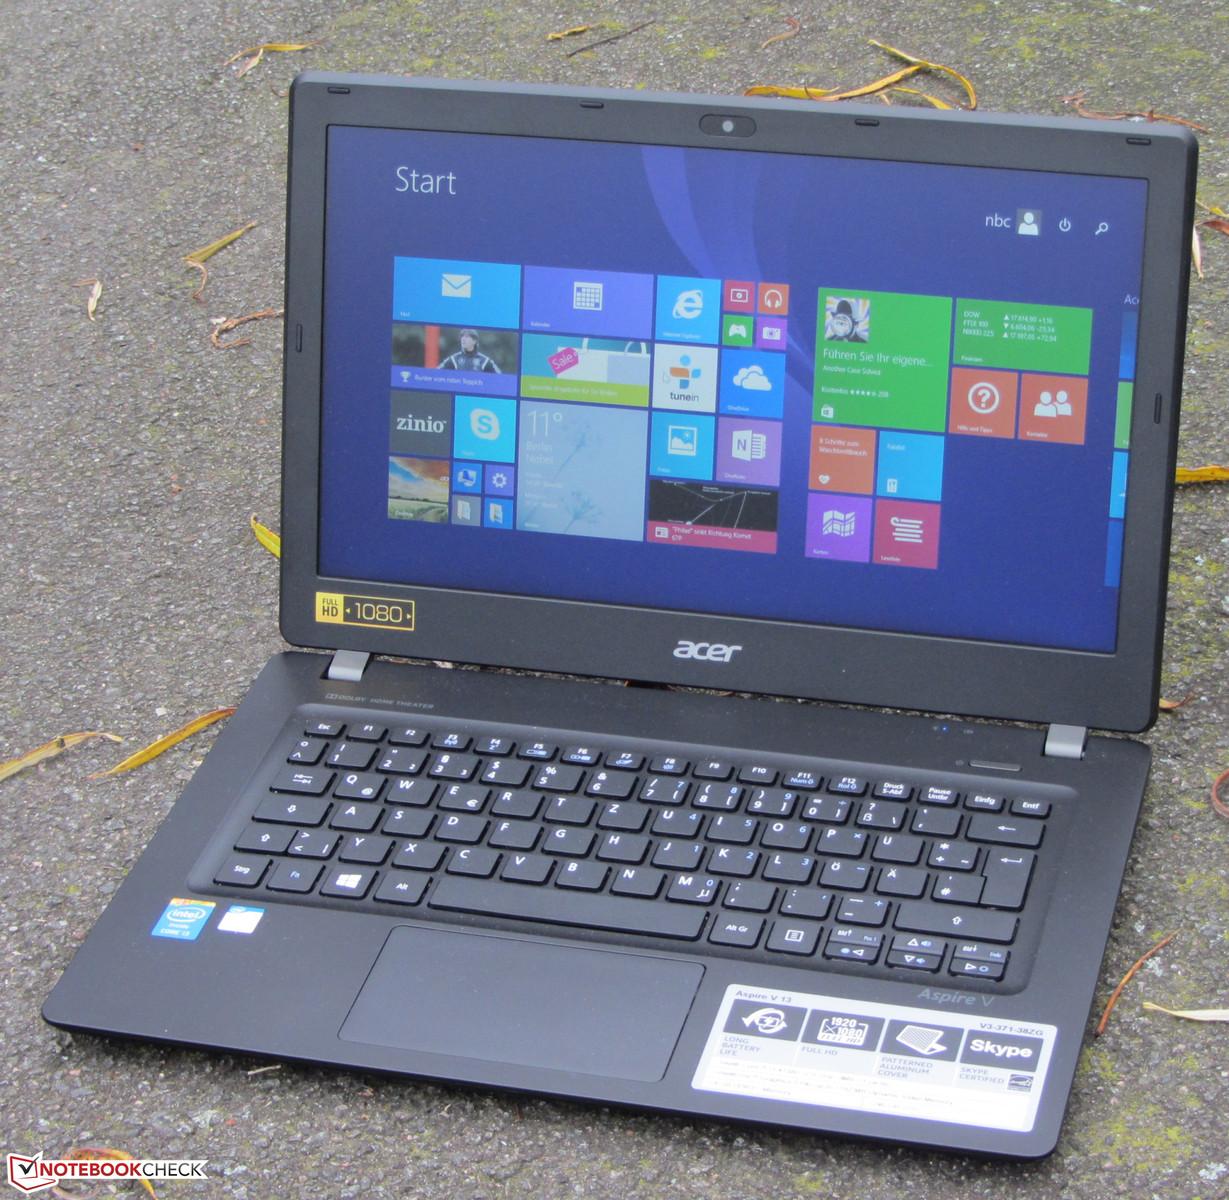 Acer Aspire V3 371 38ZG Subnotebook Review Update